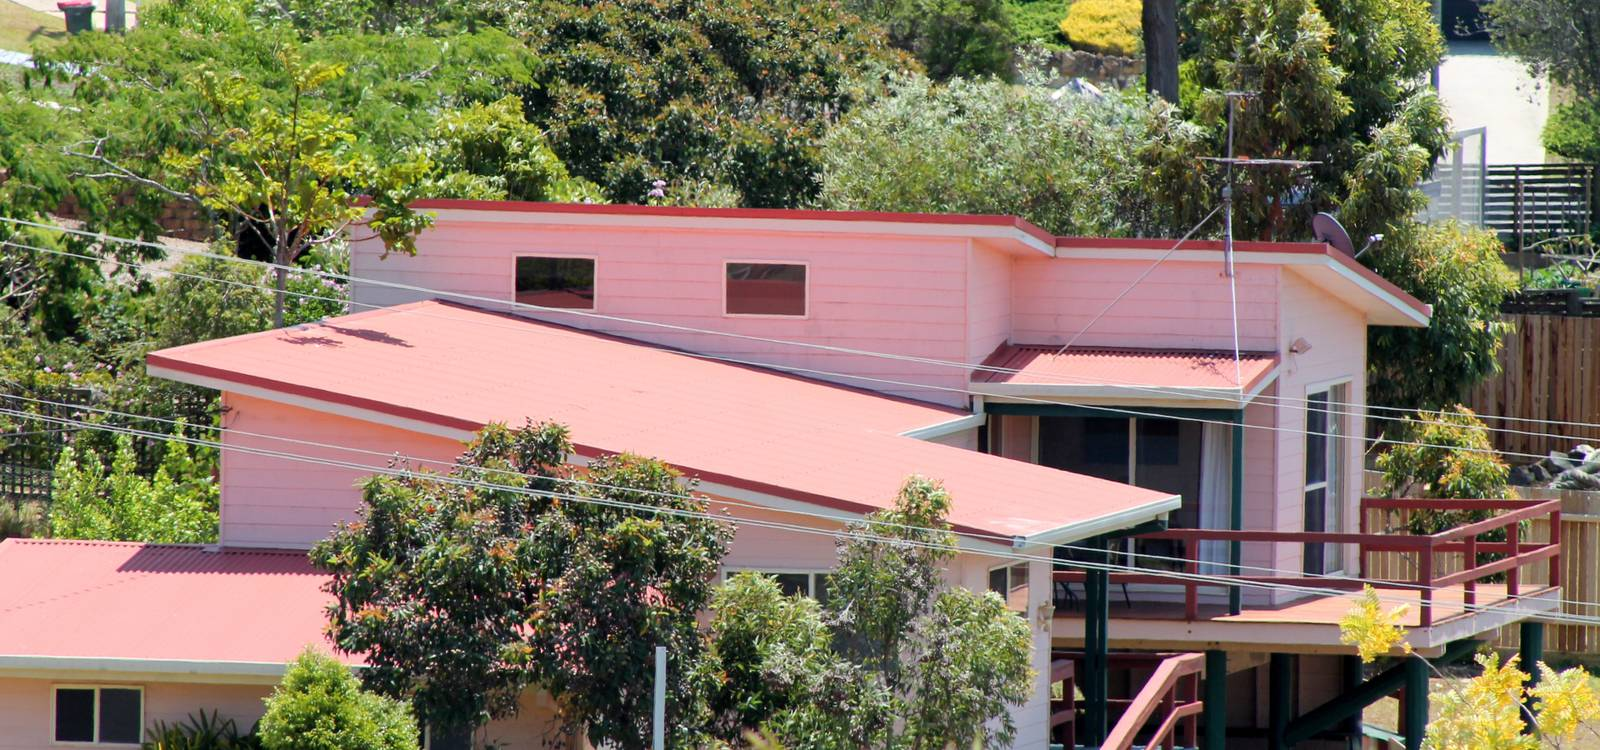 12 Anderson Avenue TUROSS HEAD, NSW 2537 - photo 1